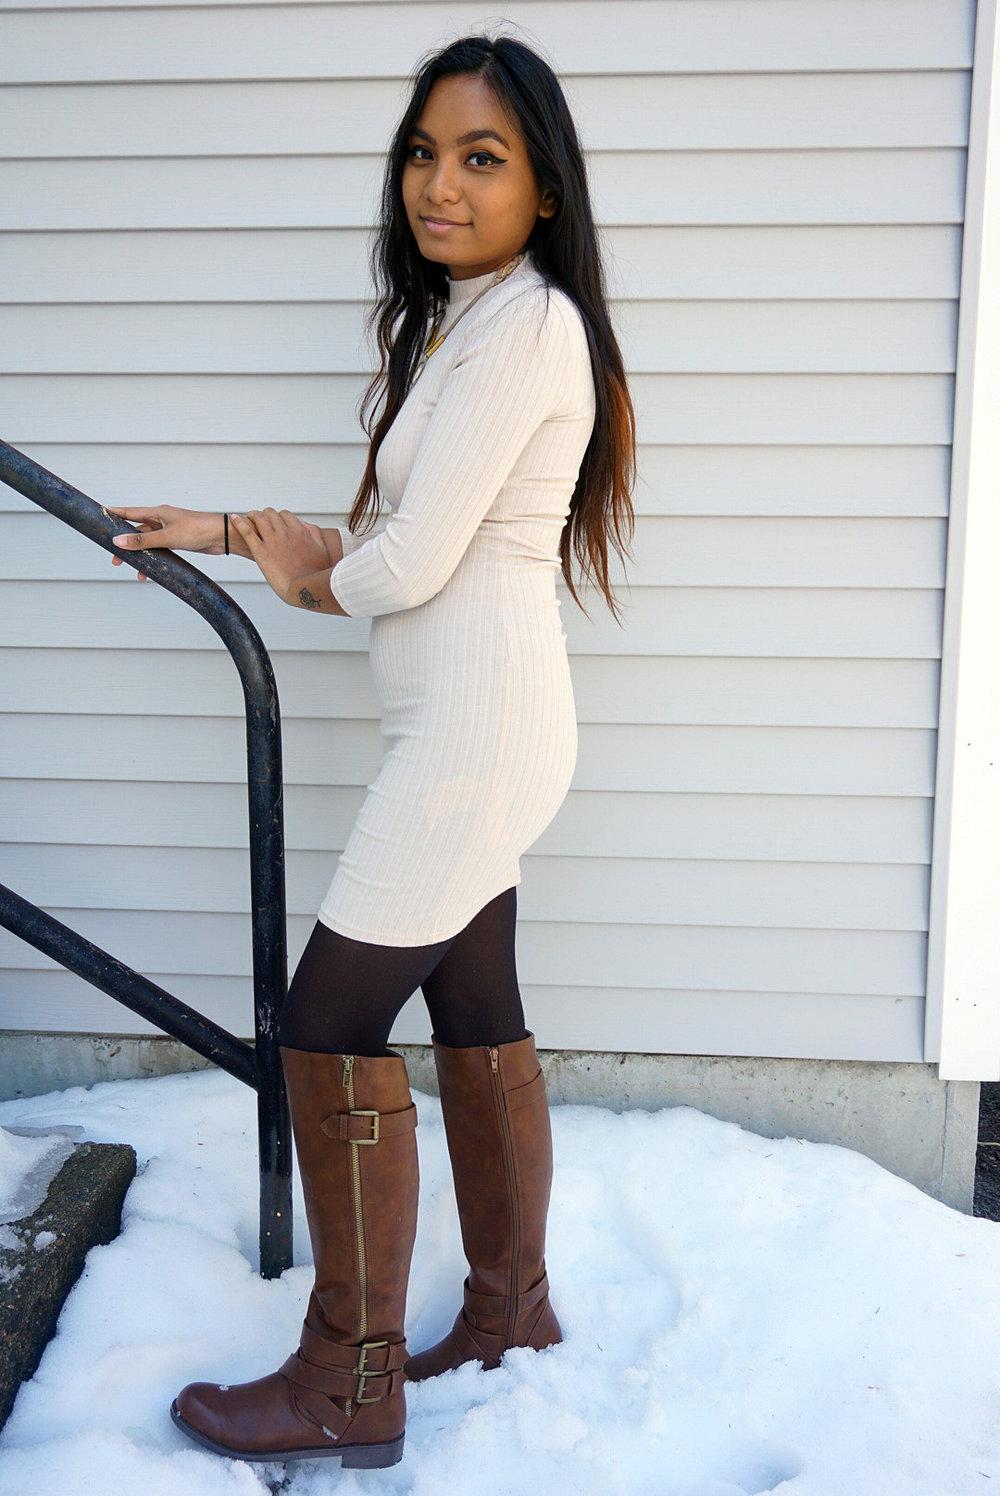 White-Dress-Caramel-Cardigan-Transitioning-To-Spring-Fashionista-Blogger-Style-LINDATENCHITRAN-11-1080x1616.jpg